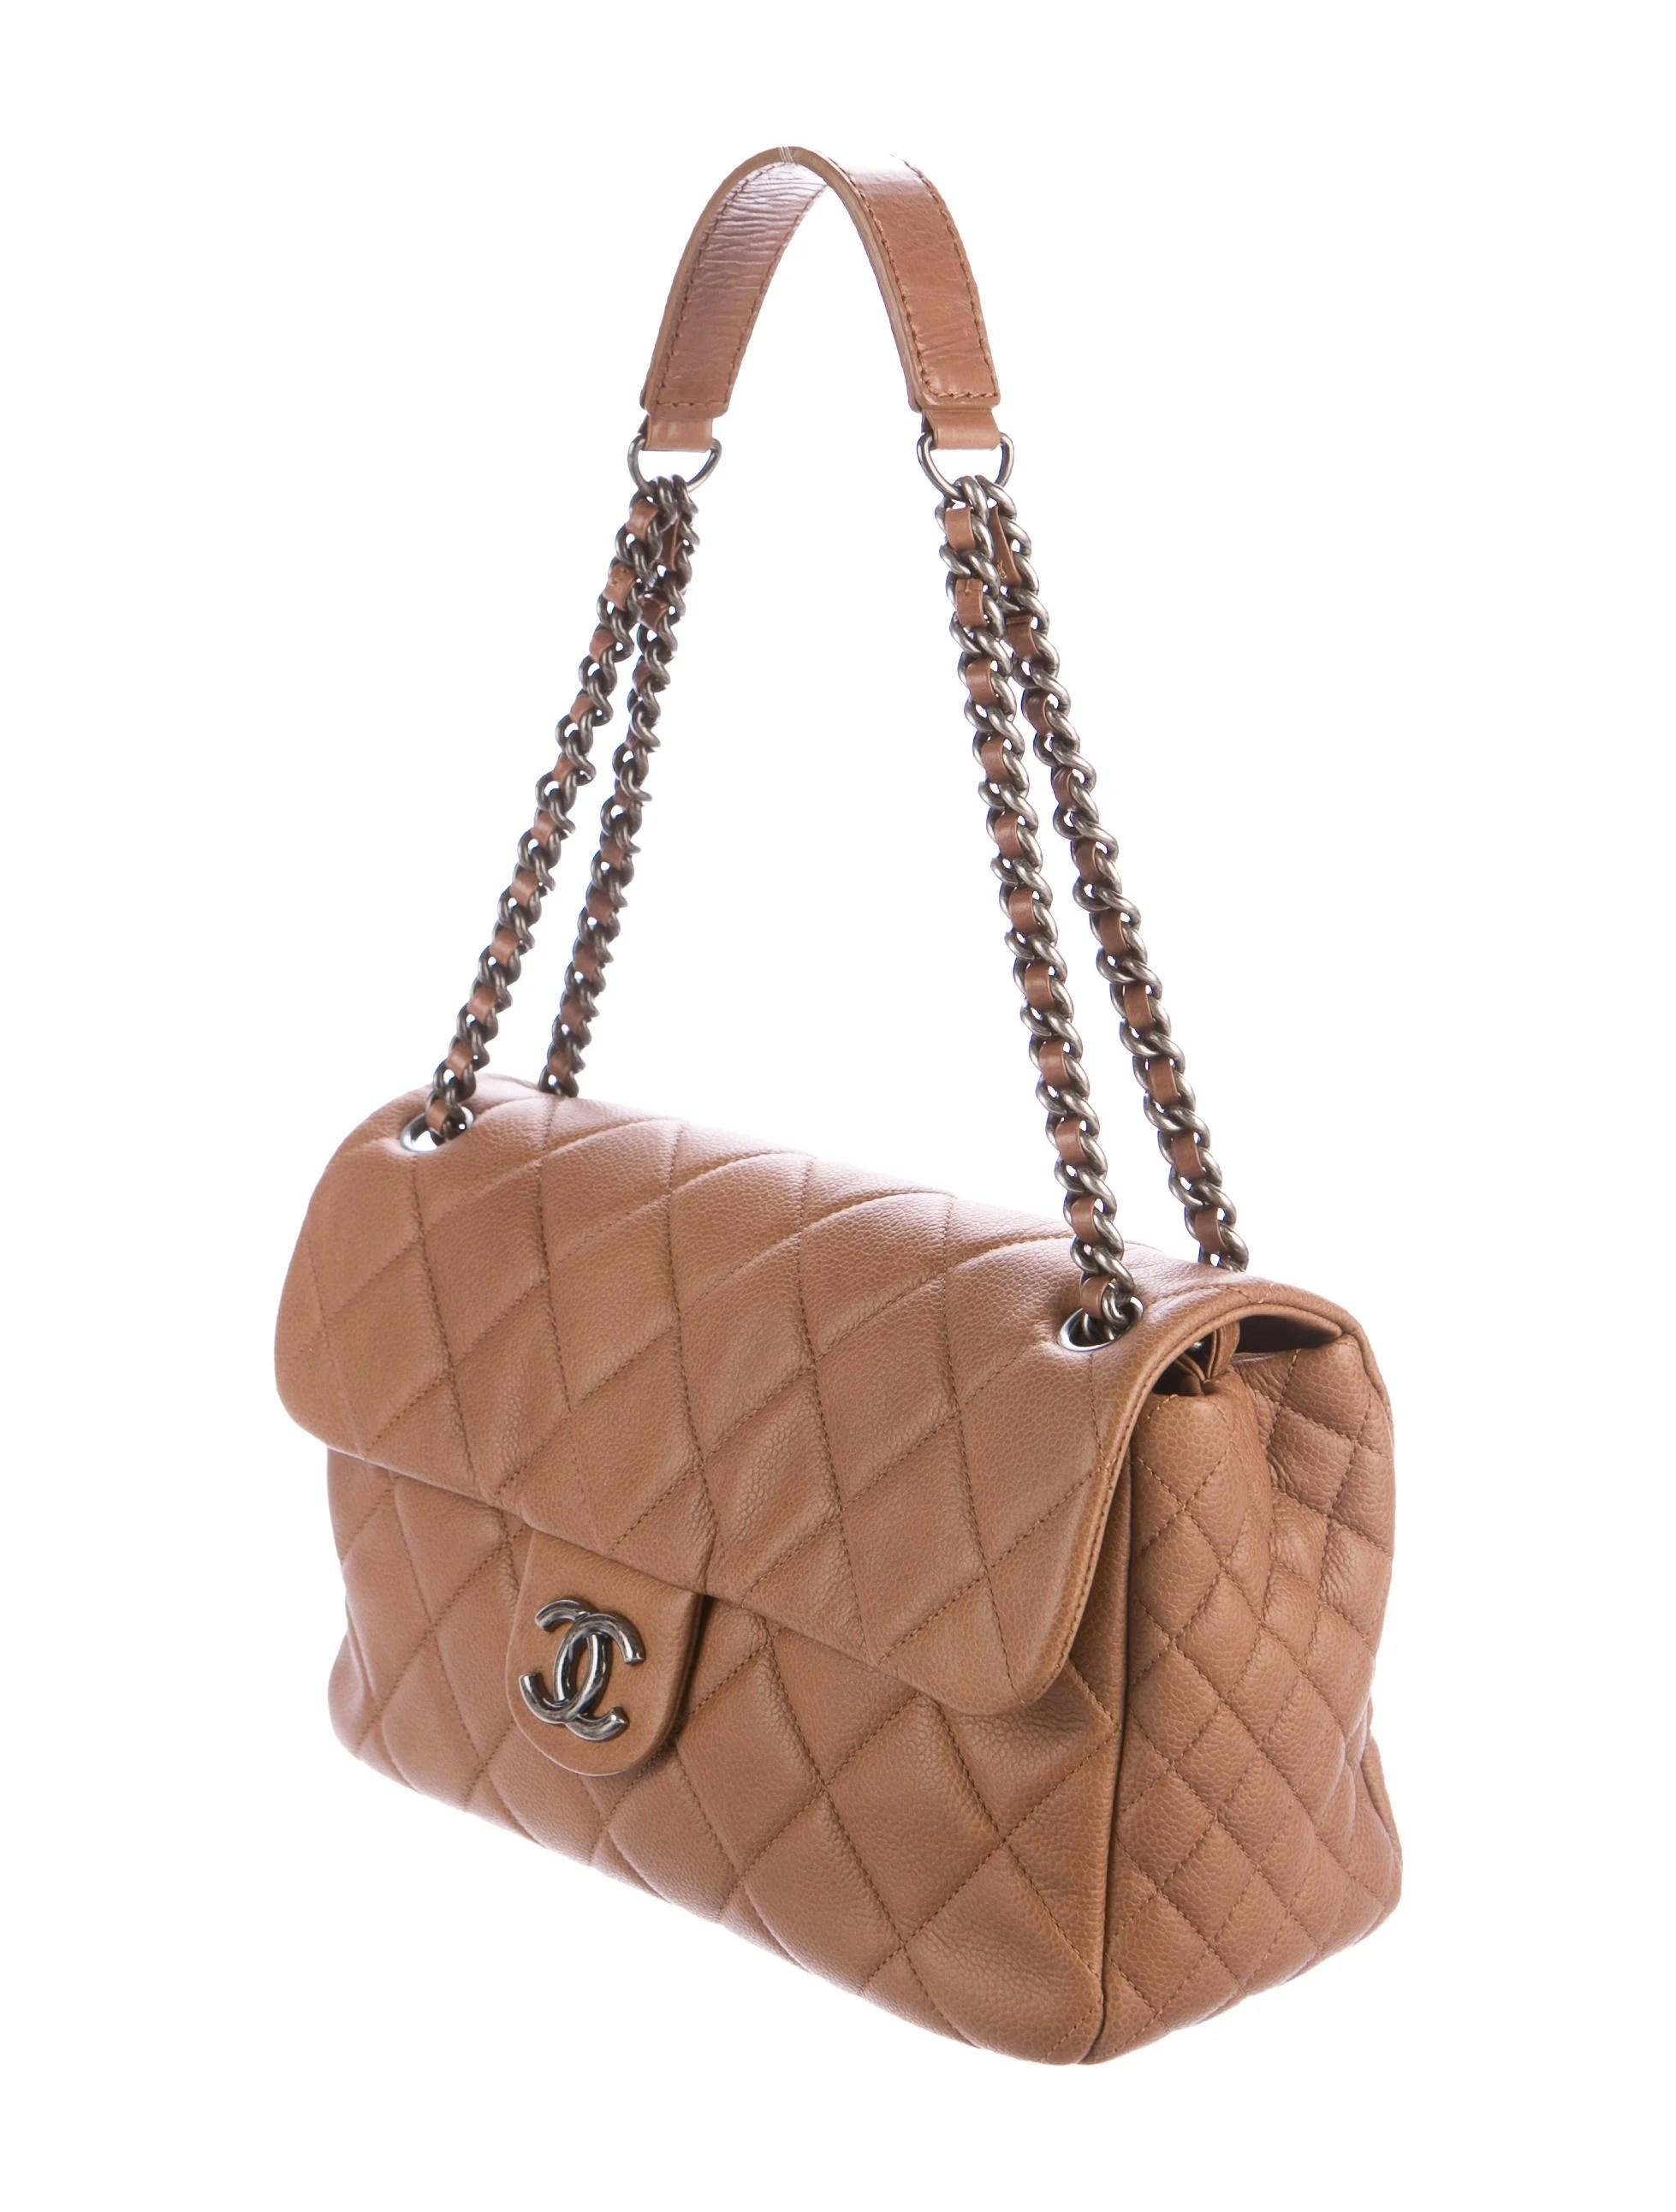 Chanel Coco Casual Flap Bag - Handbags - CHA188292   The ...